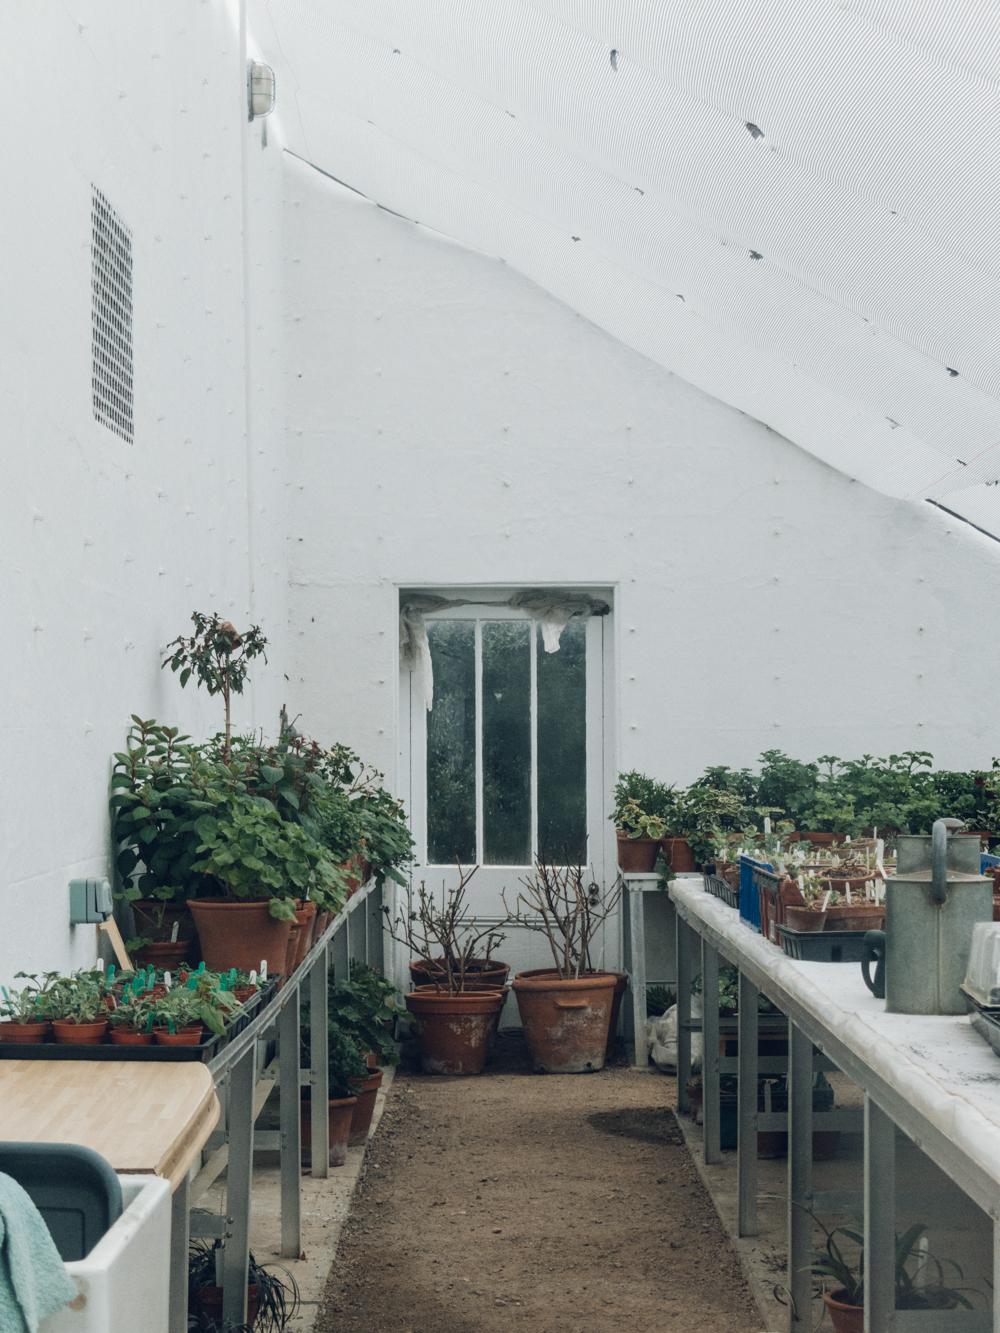 Haarkon Clumber Park Sherwood Forest National Trust Glasshouse Greenhouse Garden Plants